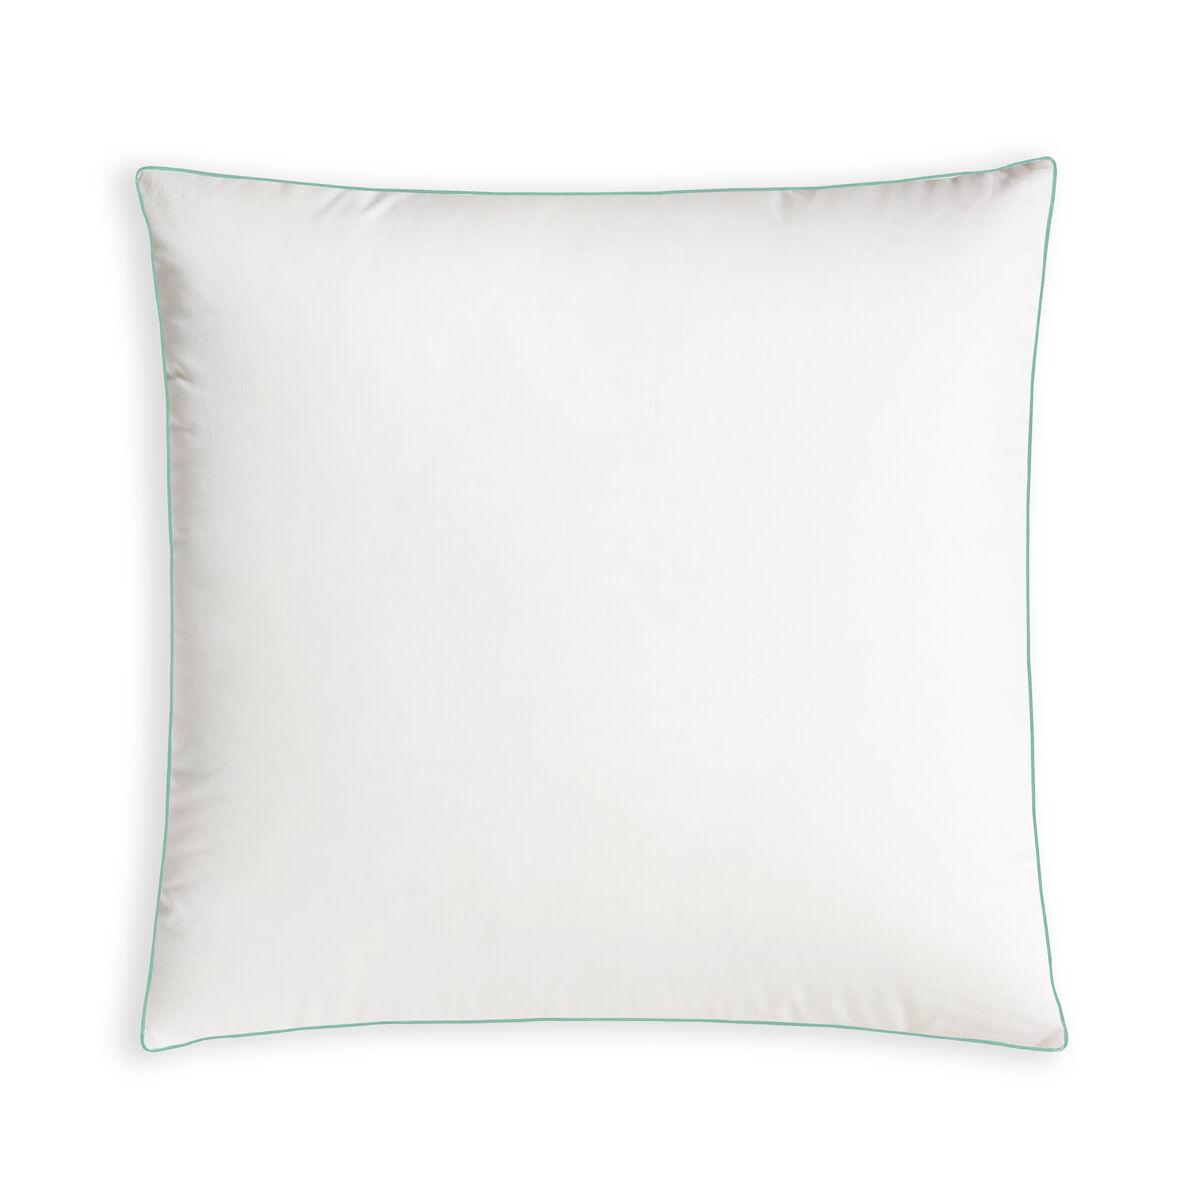 WAKE ME GREEN Oreiller FERME Gonflant Durable - Coton Bio  50x70 cm